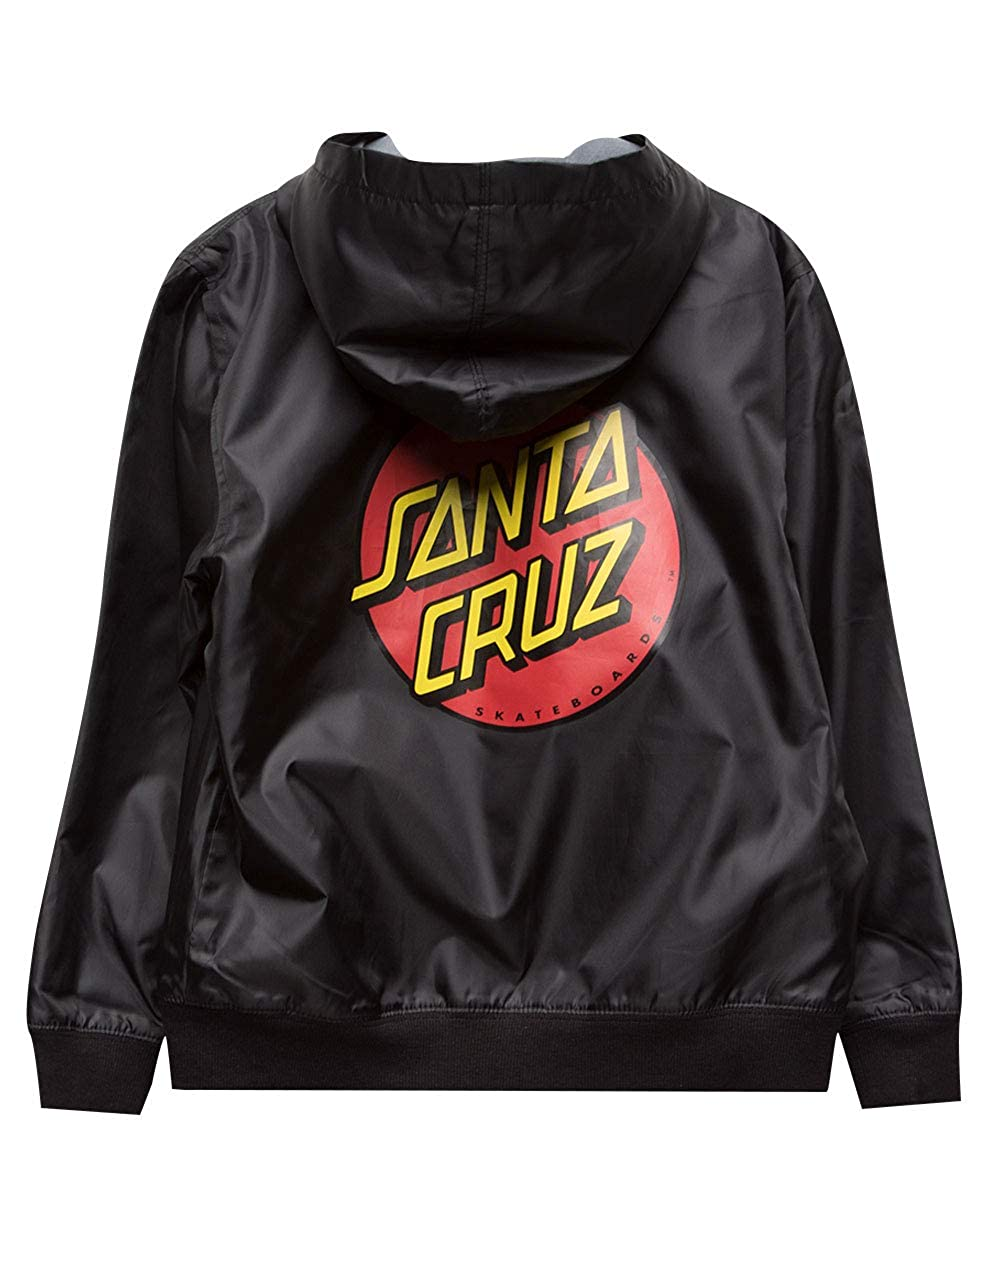 Santa Cruz Boys Dot Hooded Windbreaker Jacket 44641920-BLK-S-A